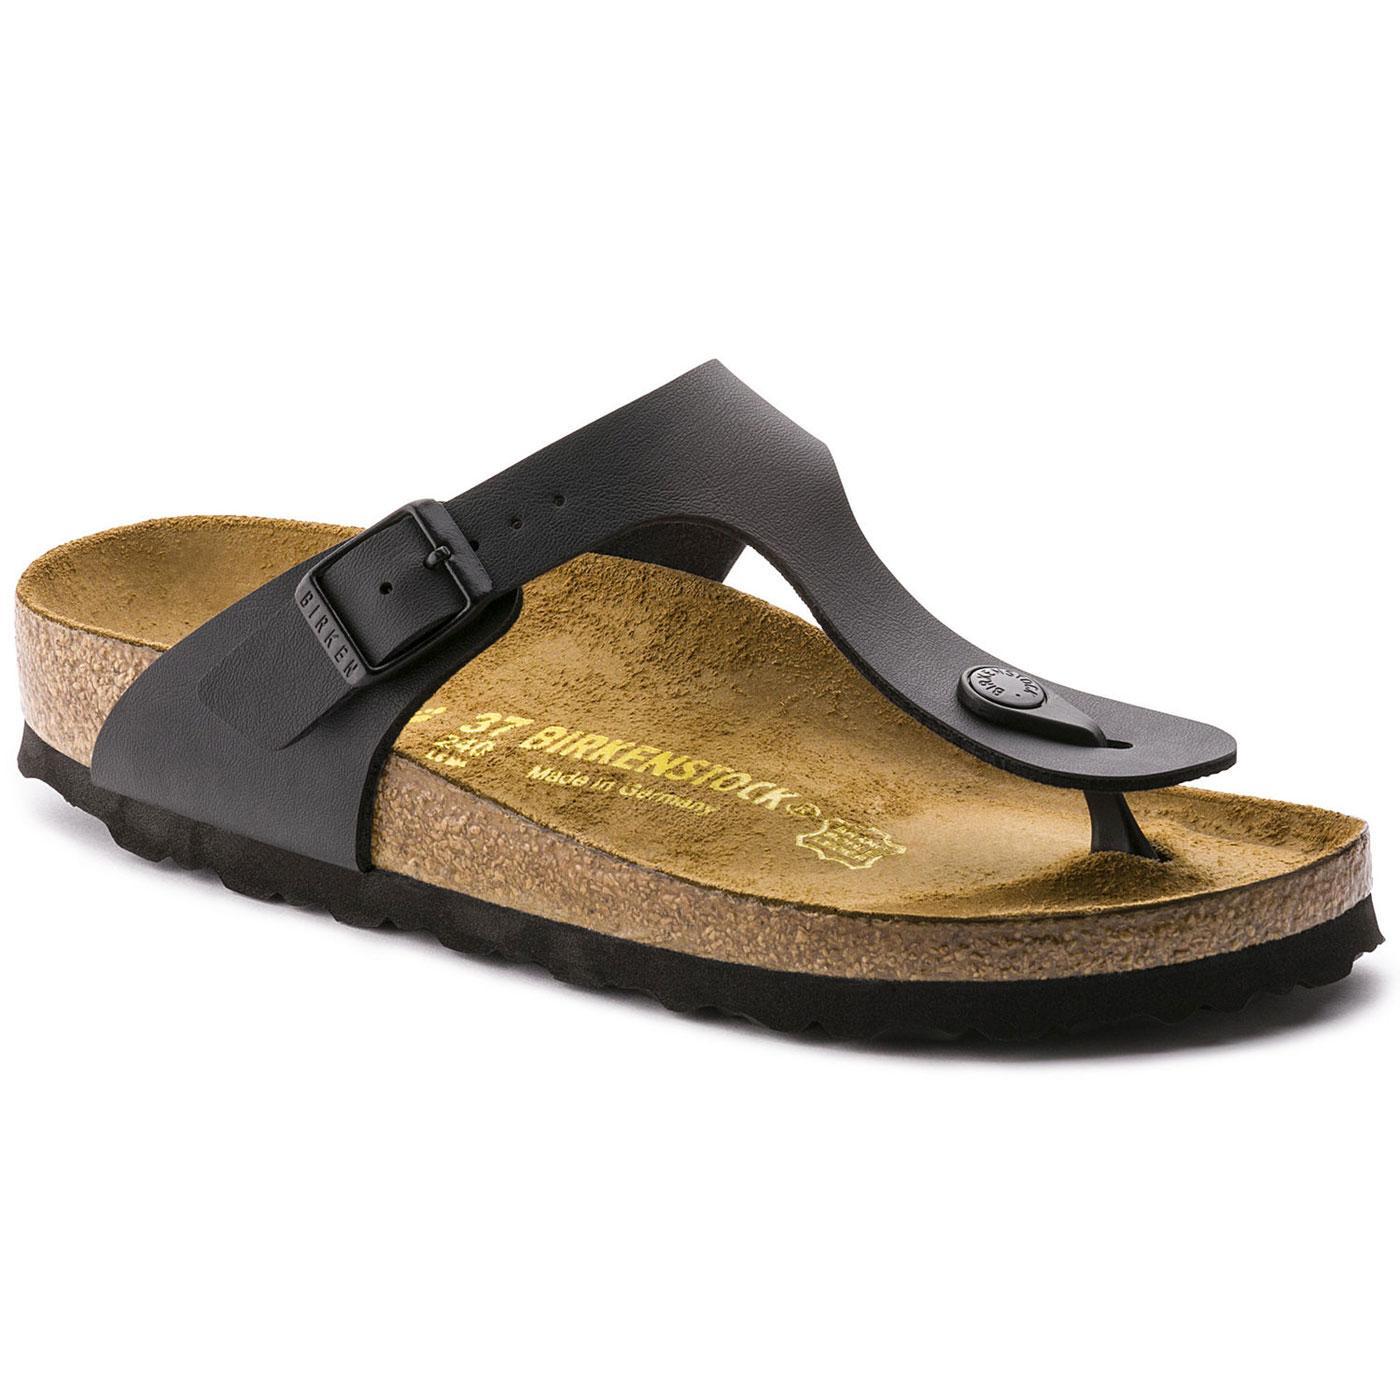 Gizeh BIRKENSTOCK Mens Retro Toe Grip Sandals B